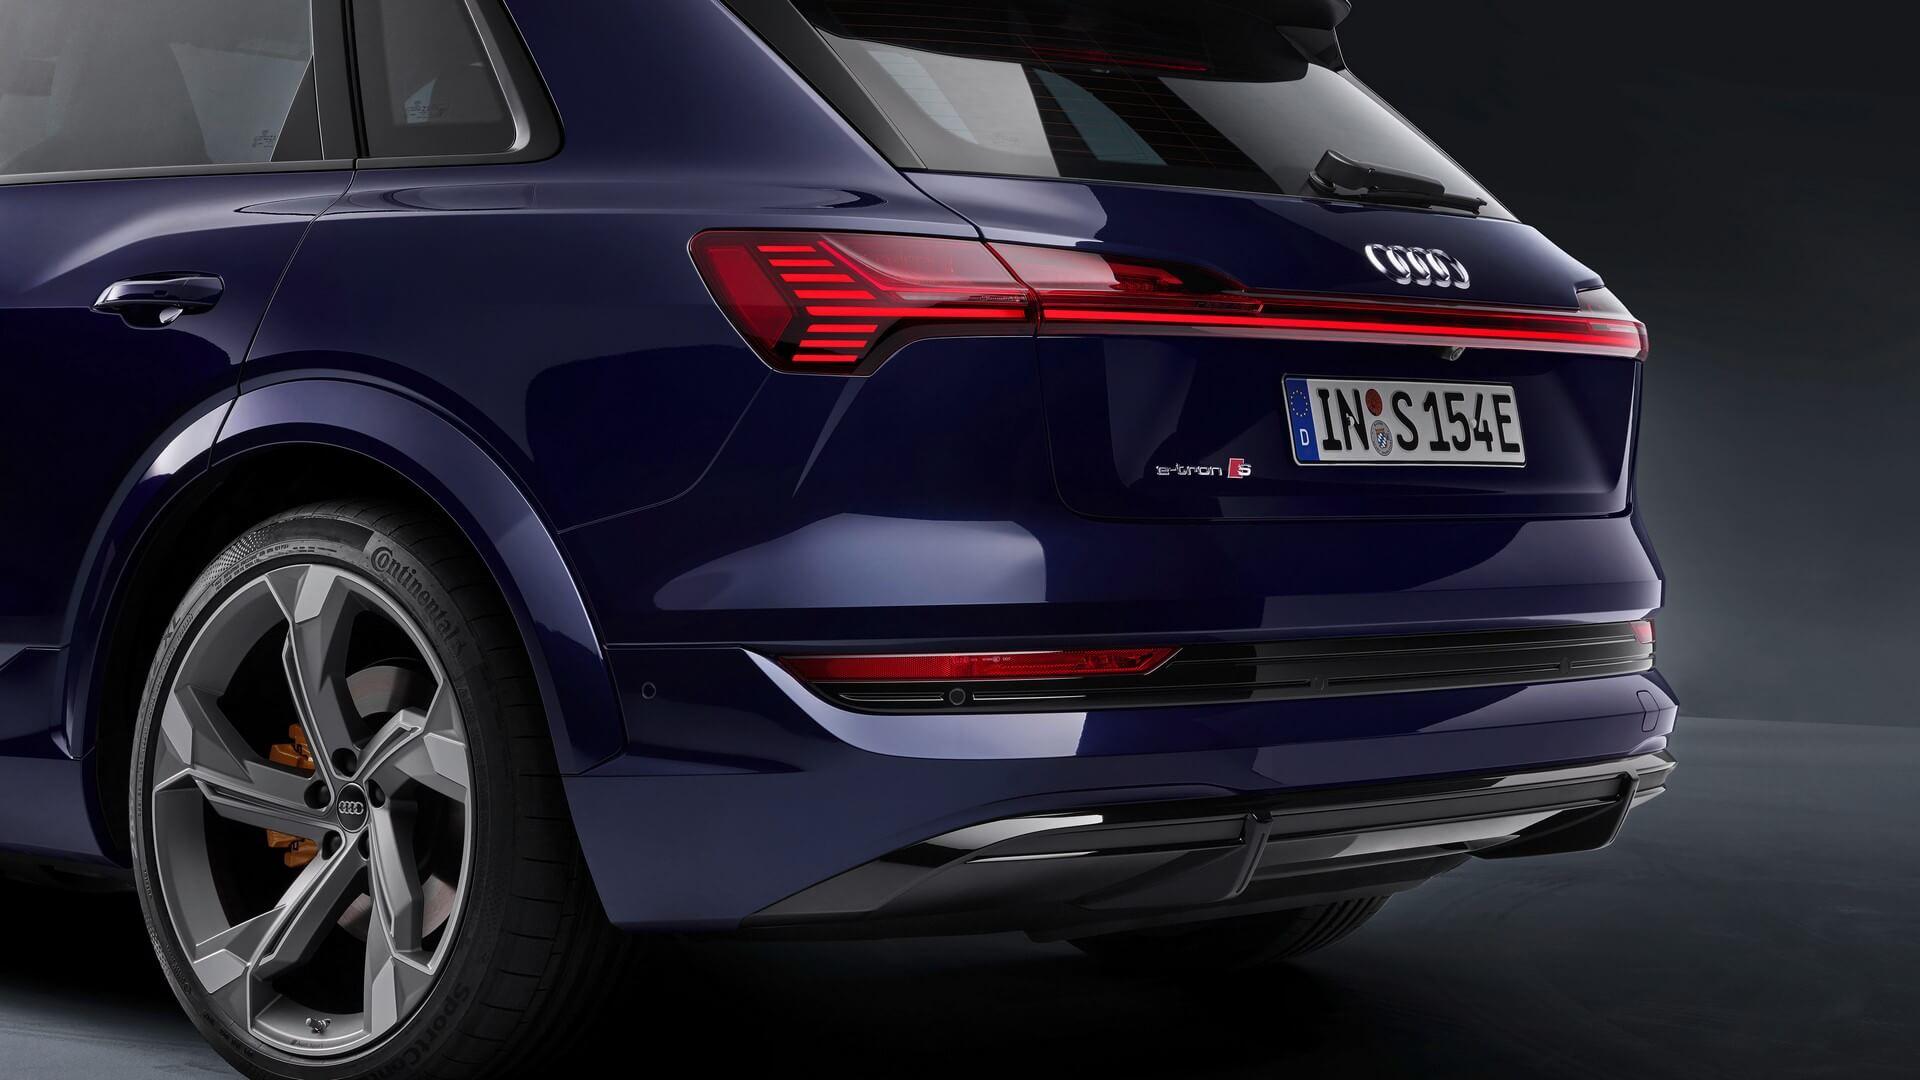 Audi-E-Tron-S-and-E-Tron-S-Sportback-2020-113